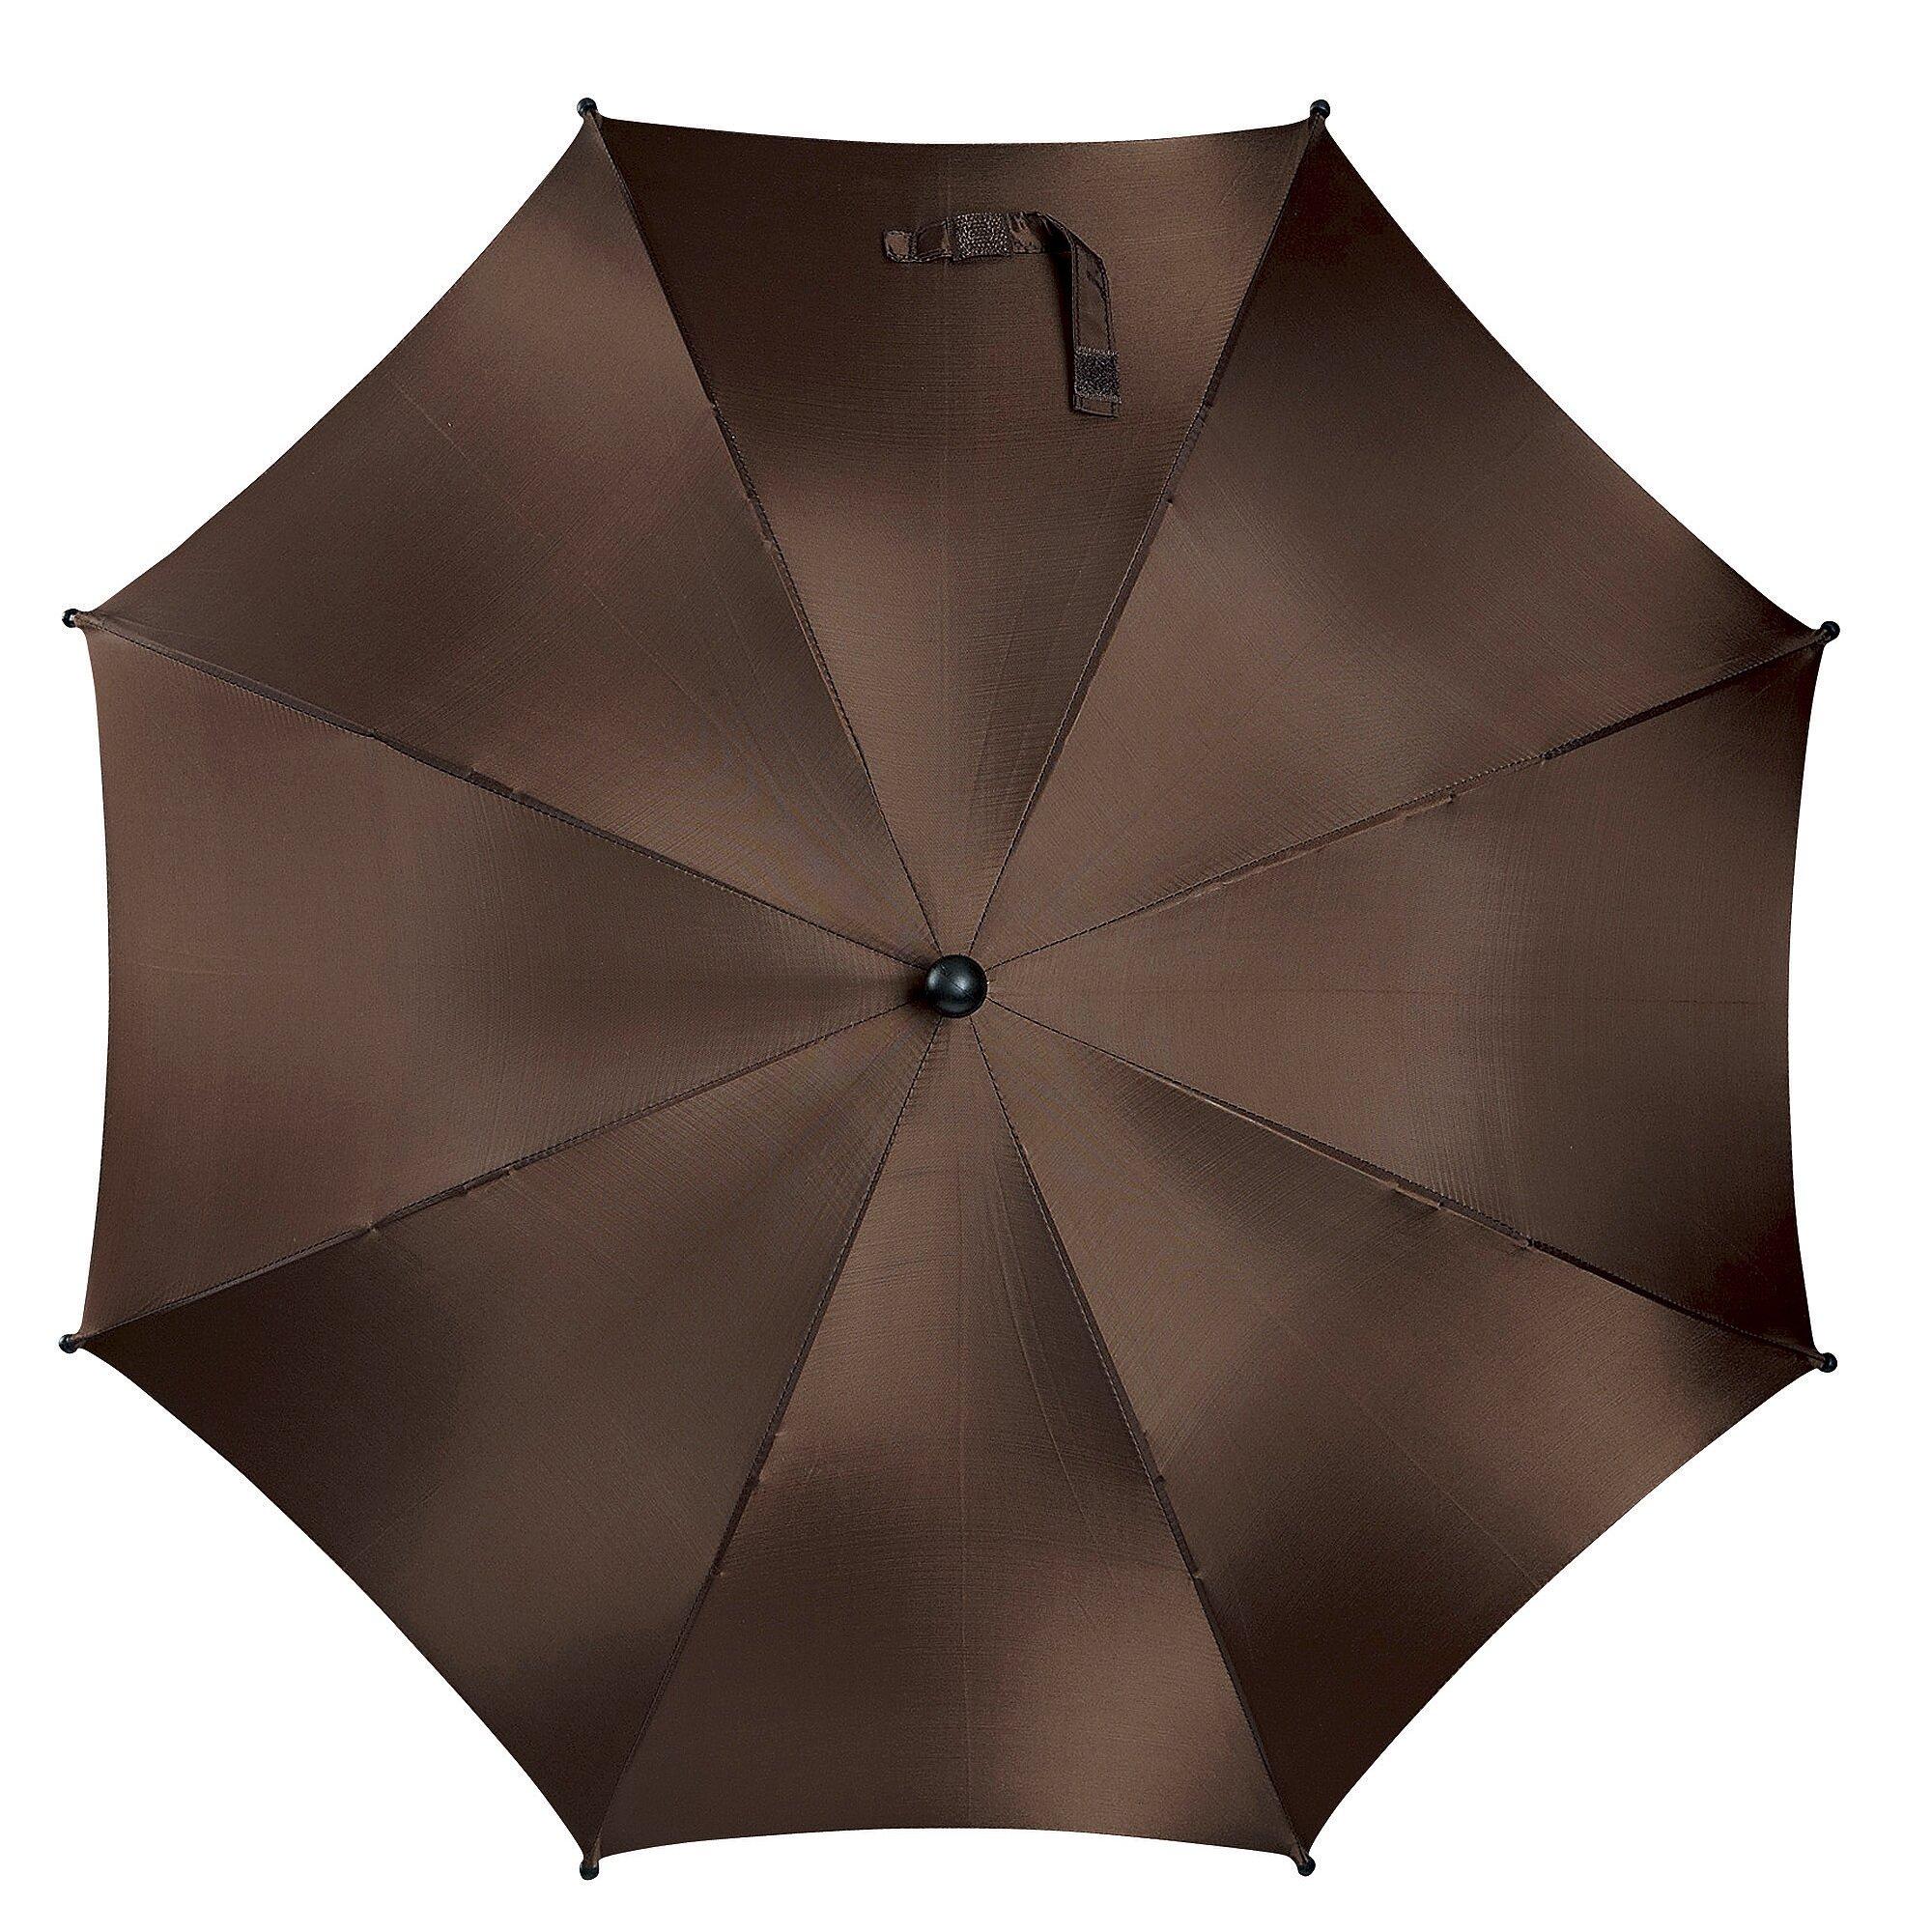 promotion parasol avec protection uv 50 chez baby walz. Black Bedroom Furniture Sets. Home Design Ideas